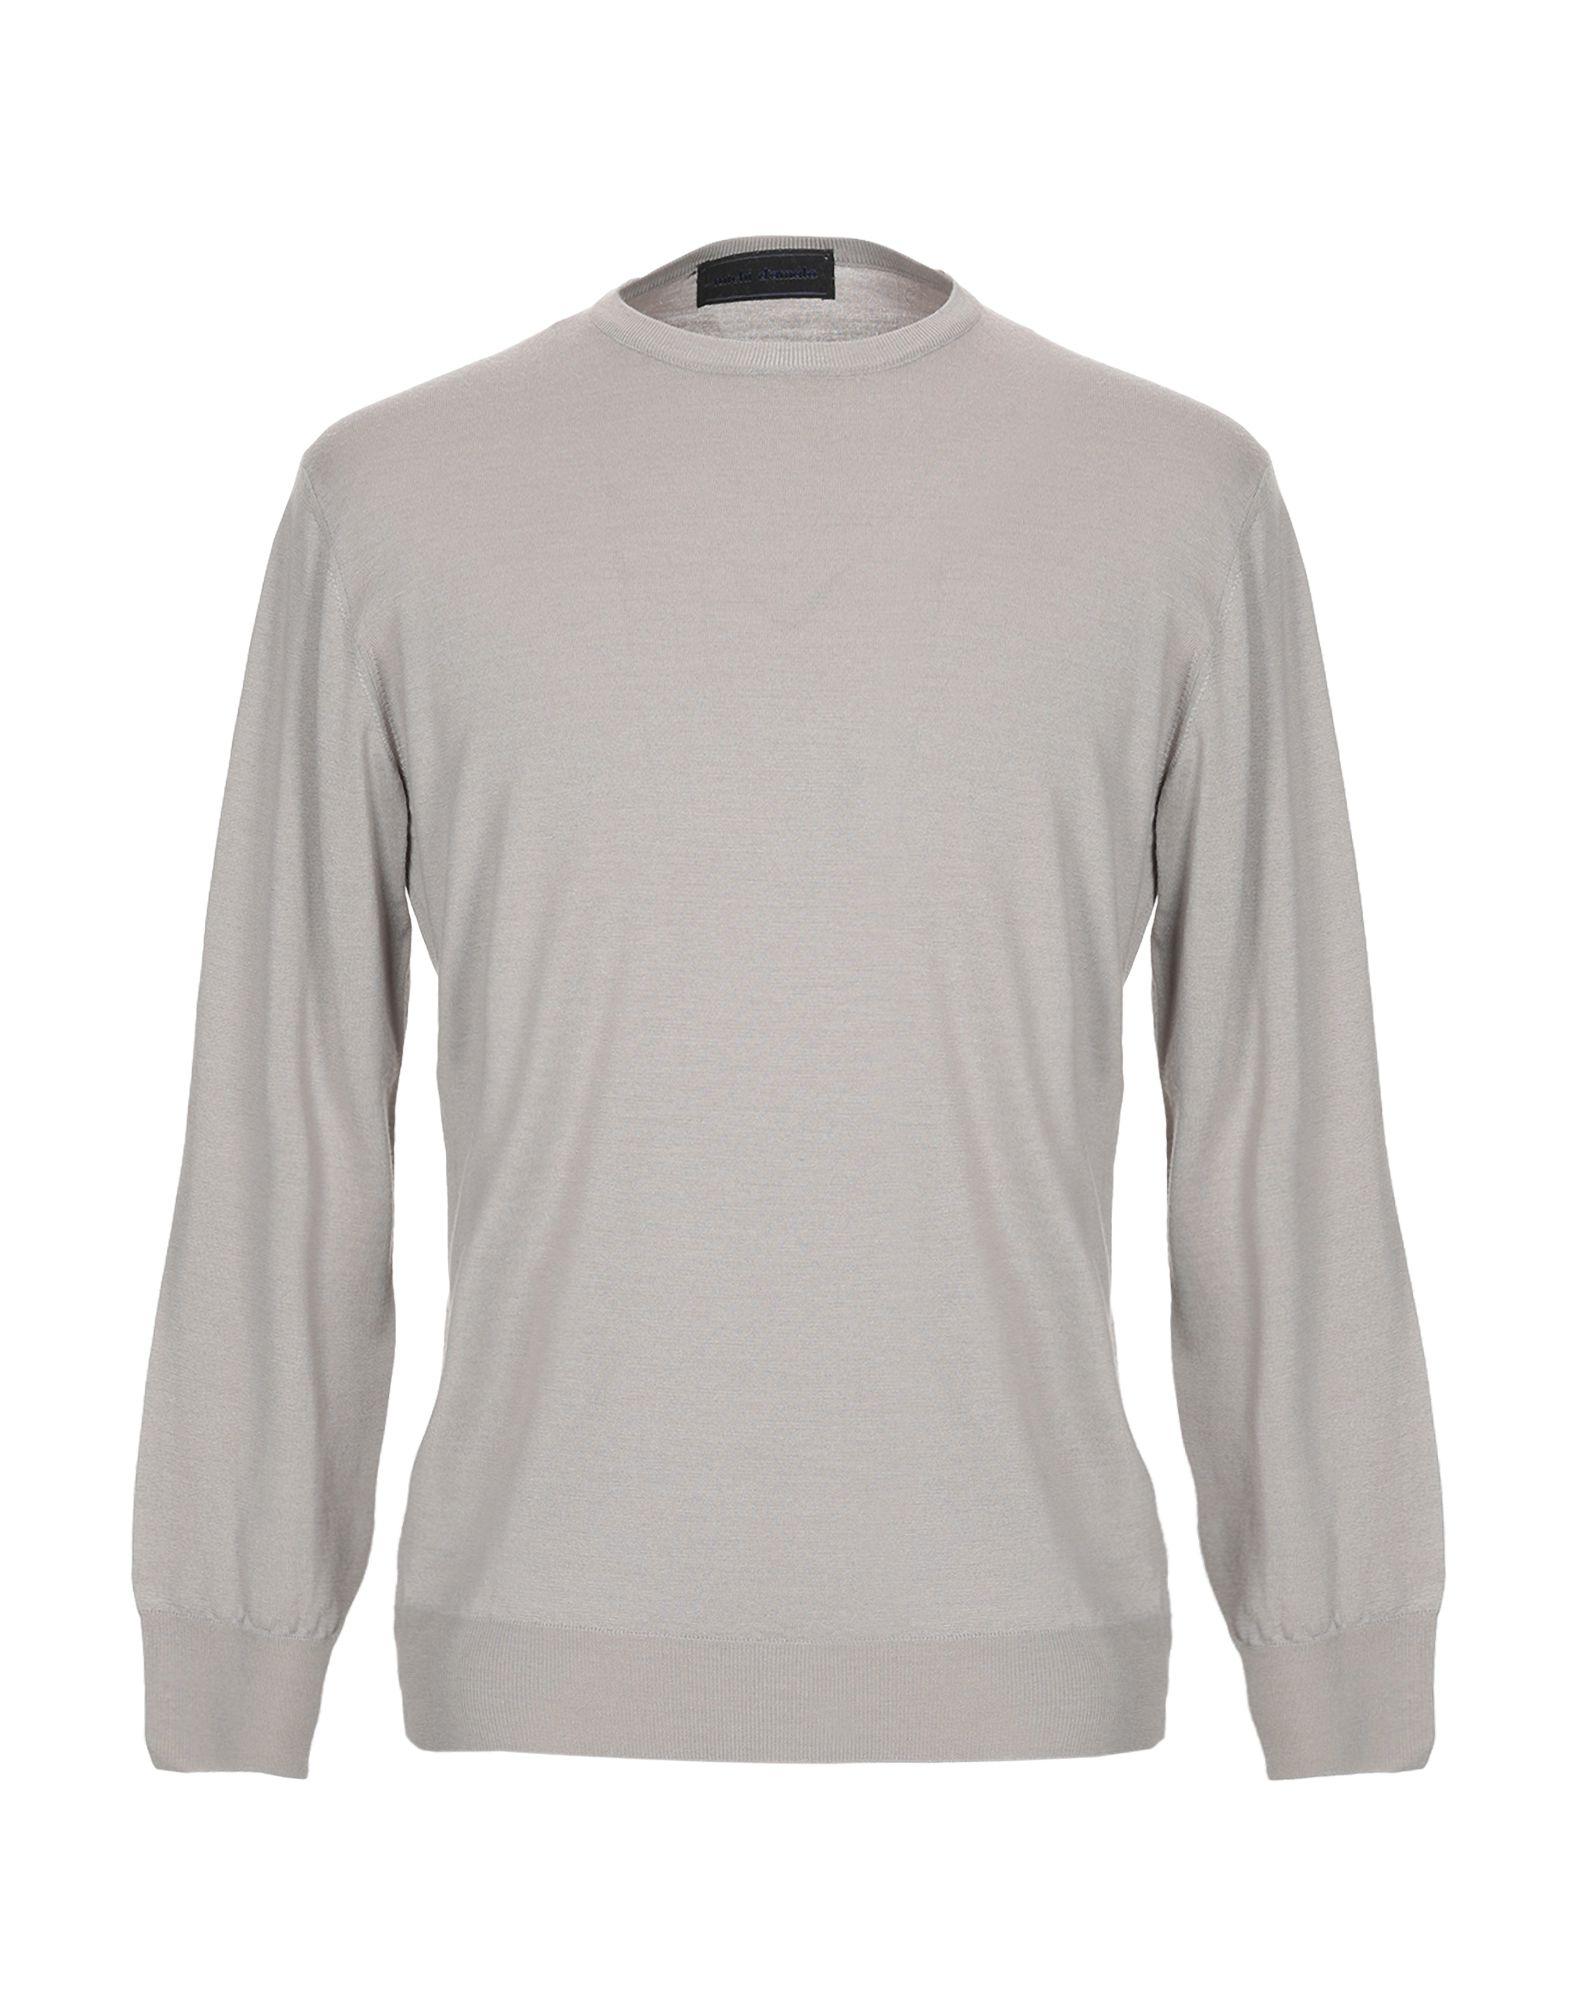 MICHI D'AMATO Свитер michi футболка